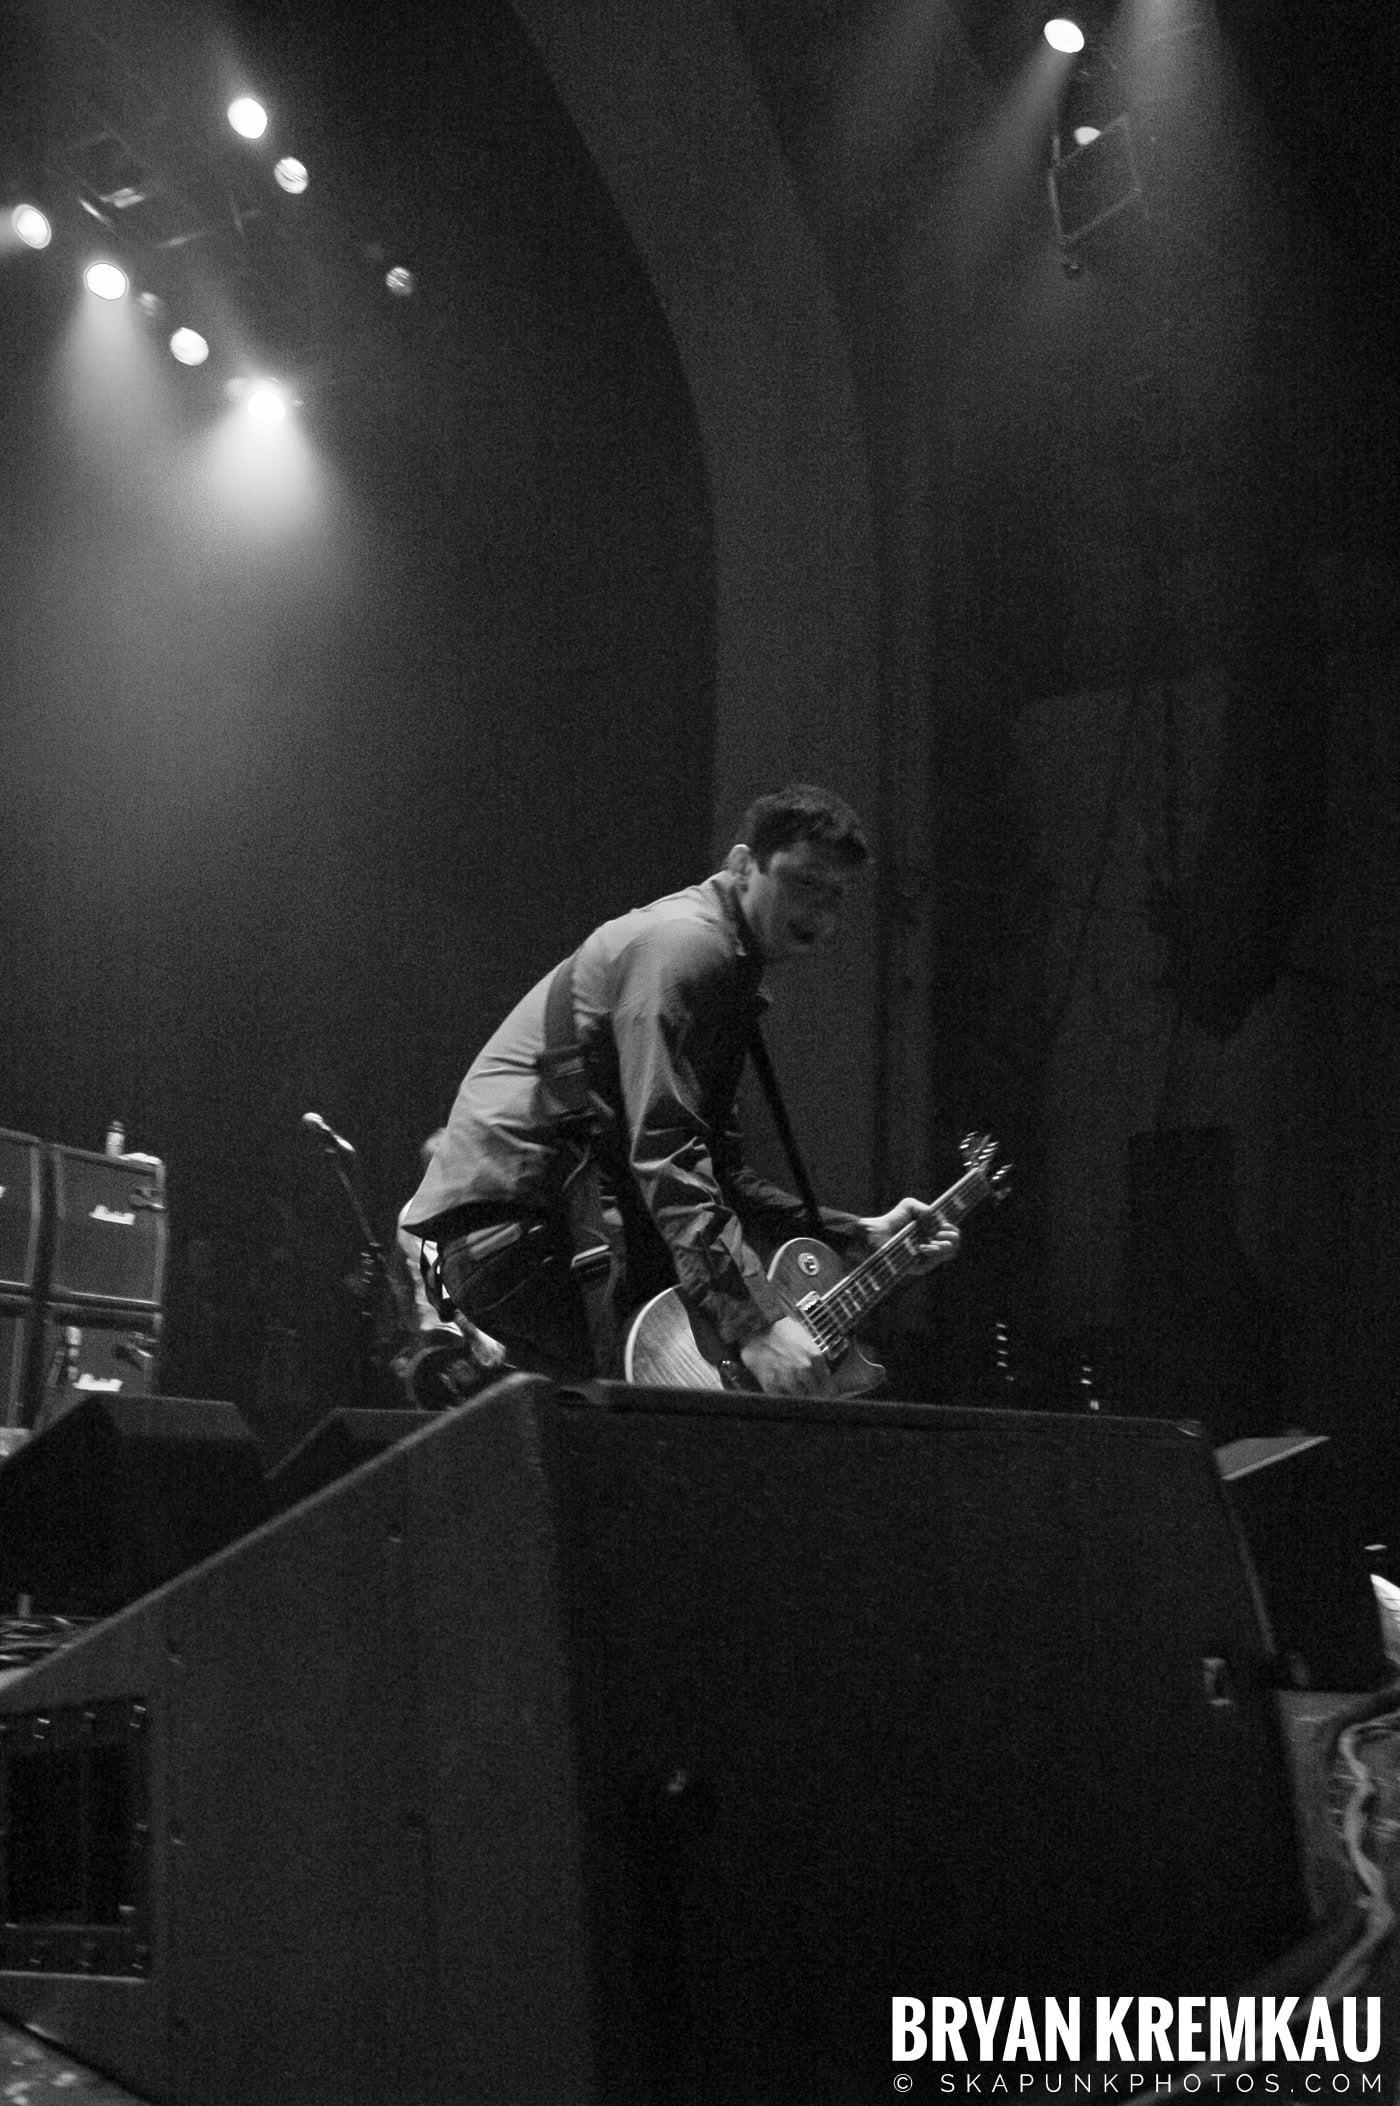 Dropkick Murphys @ Brixton Academy, London UK - 12.19.05 (6)